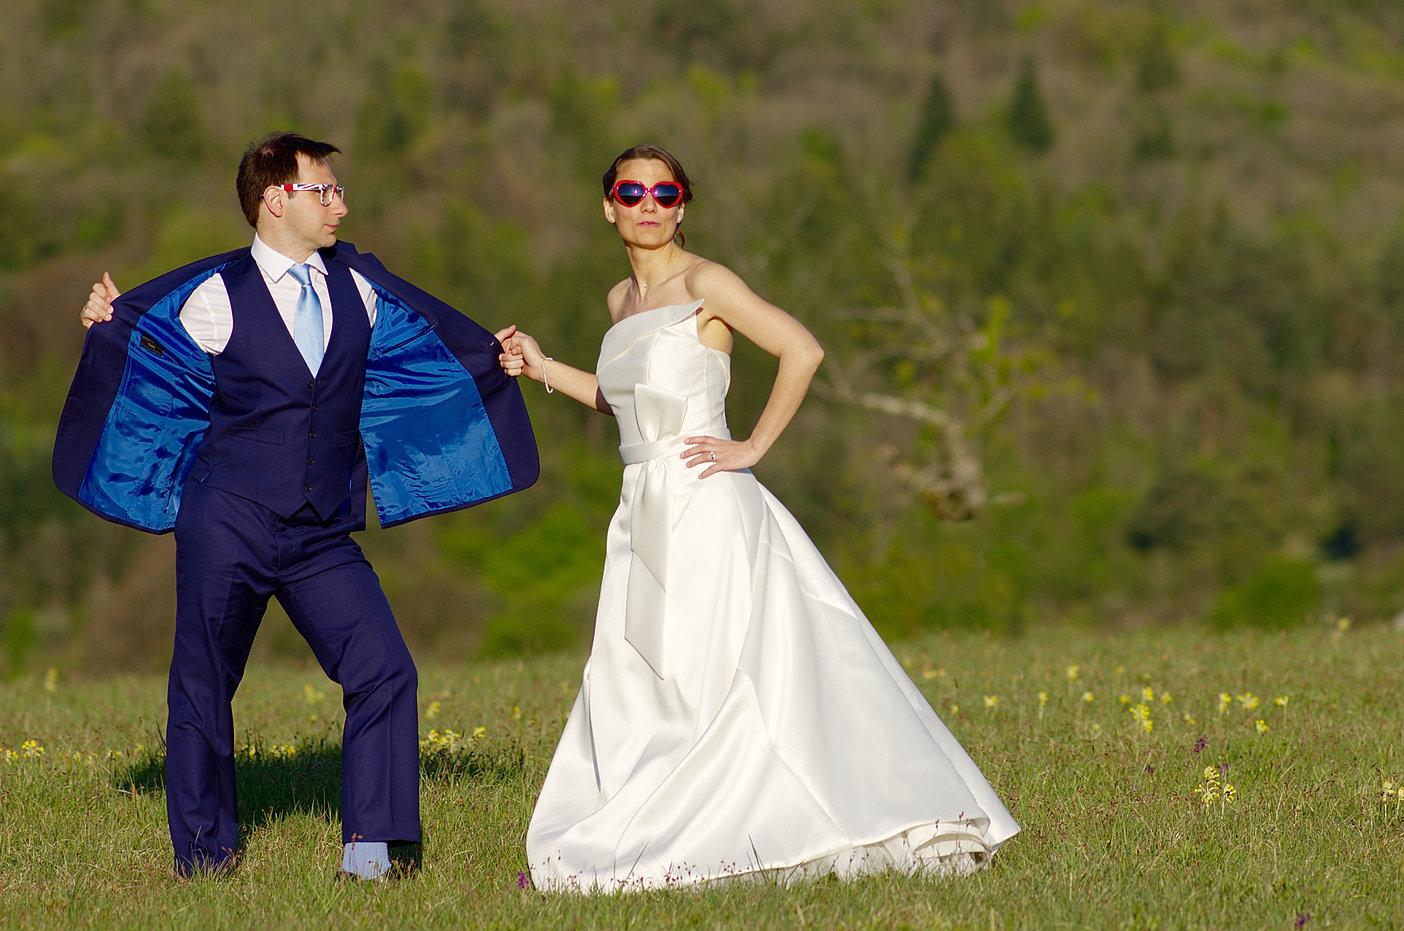 photographe mariage besancon - Photographe Mariage Besancon